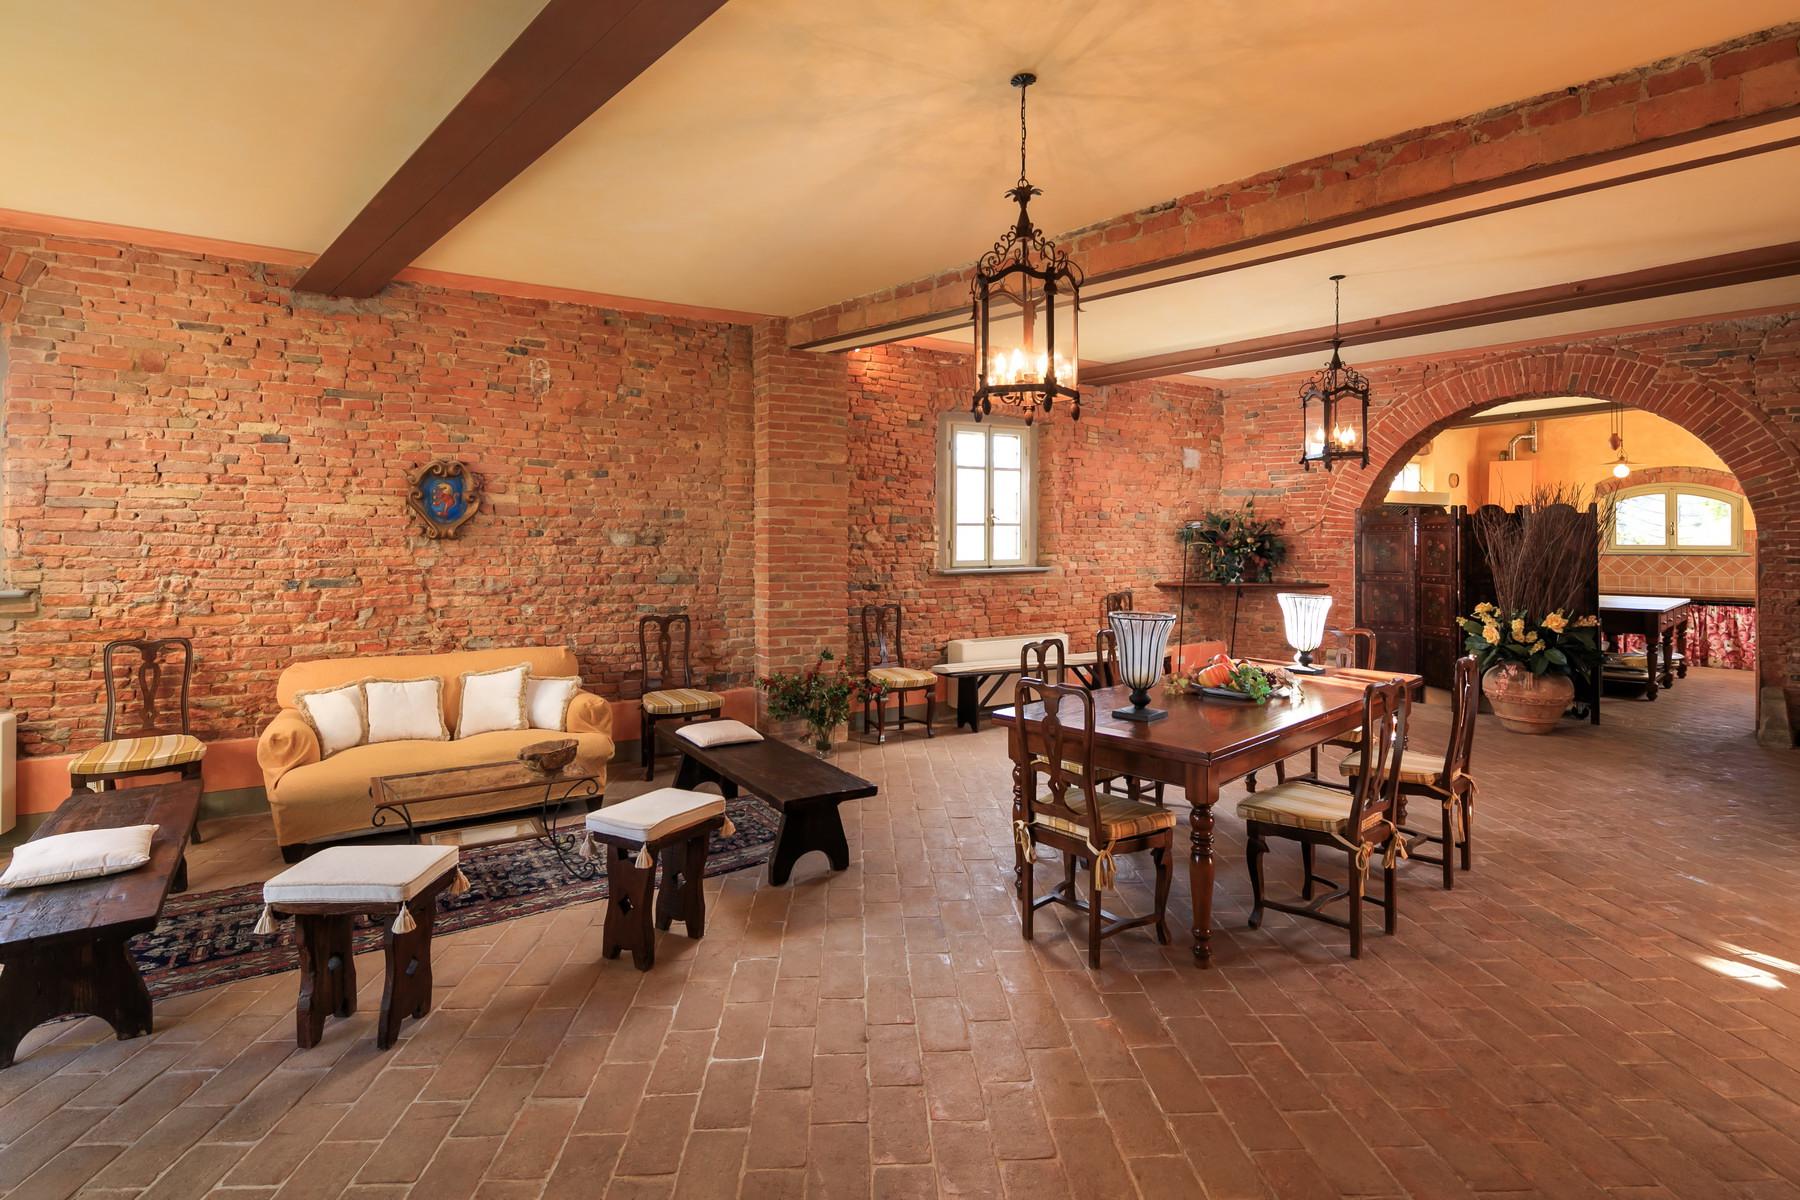 Villa in Vendita a Casciana Terme Lari: 5 locali, 550 mq - Foto 20